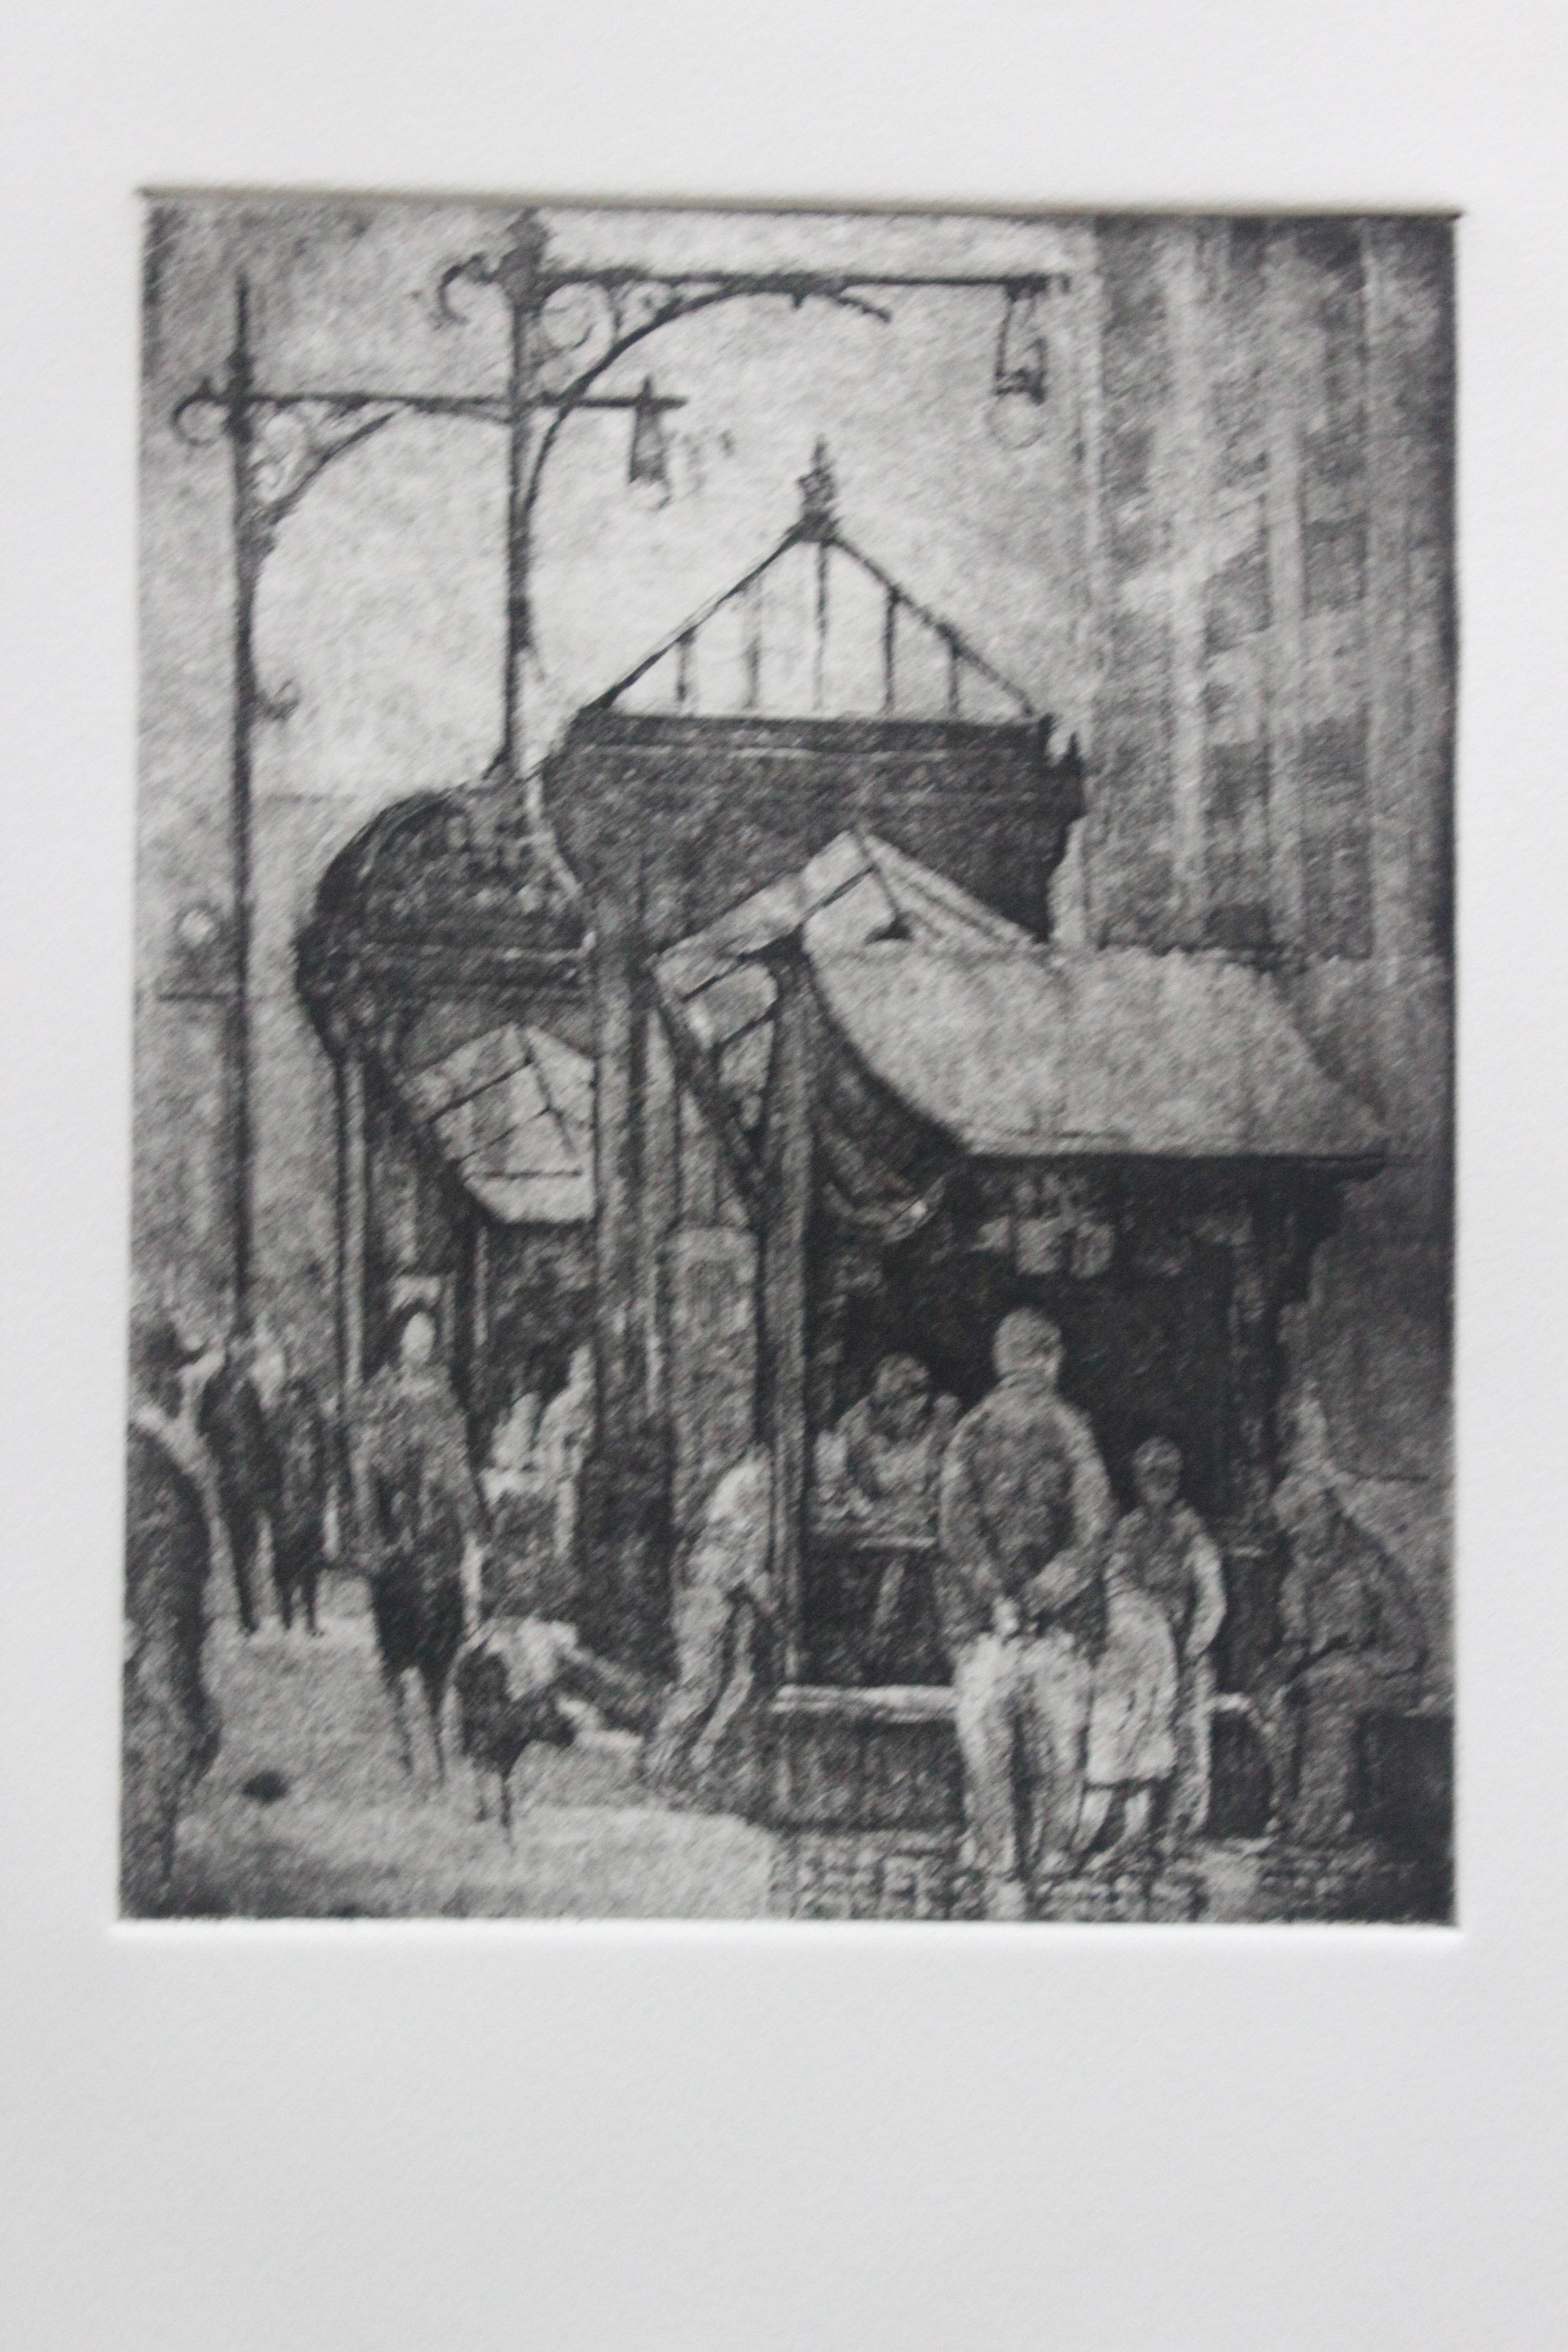 Paul Goranson, News Stand, 1949